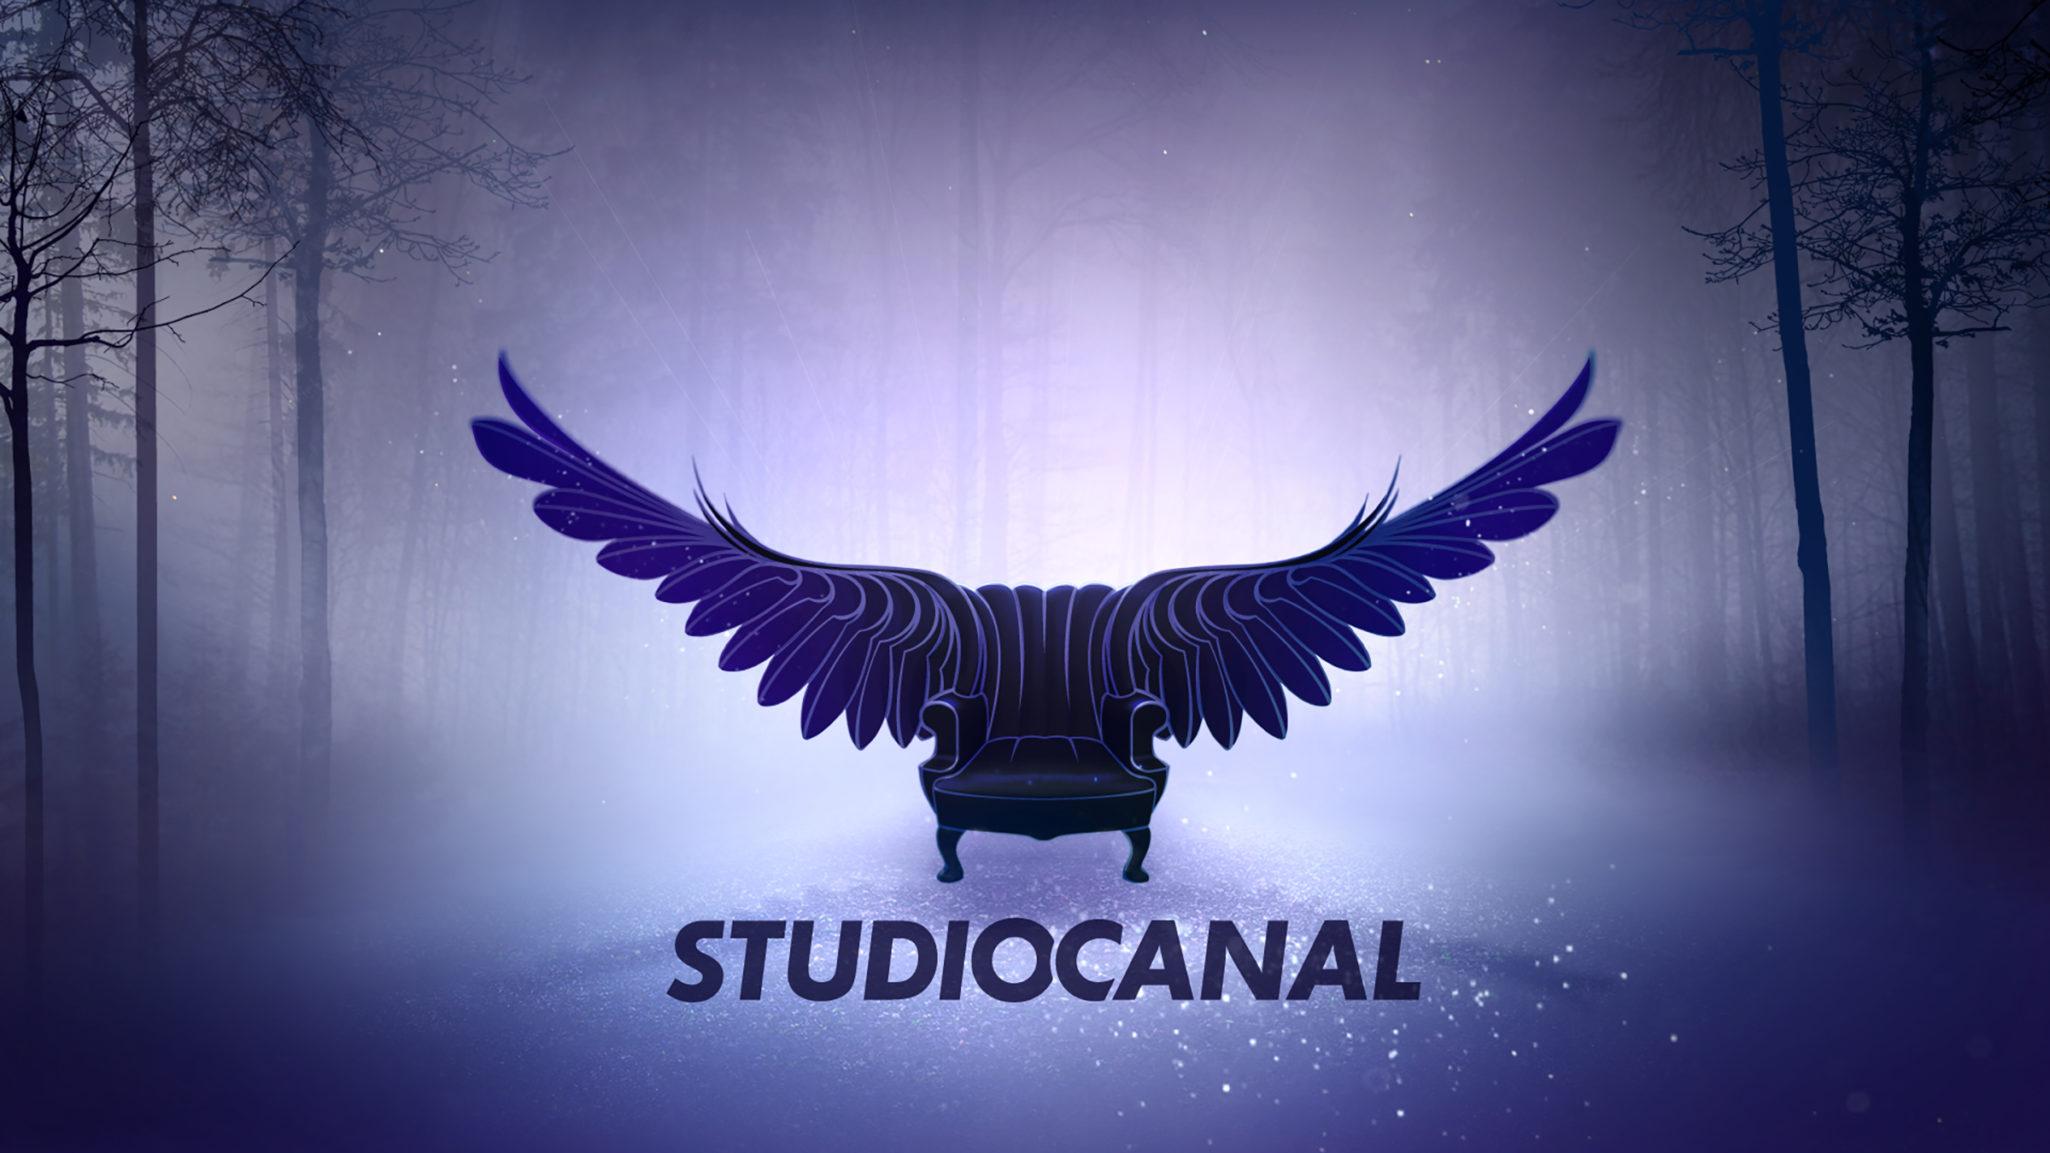 Styleframe: Packshot for studiocanal opener